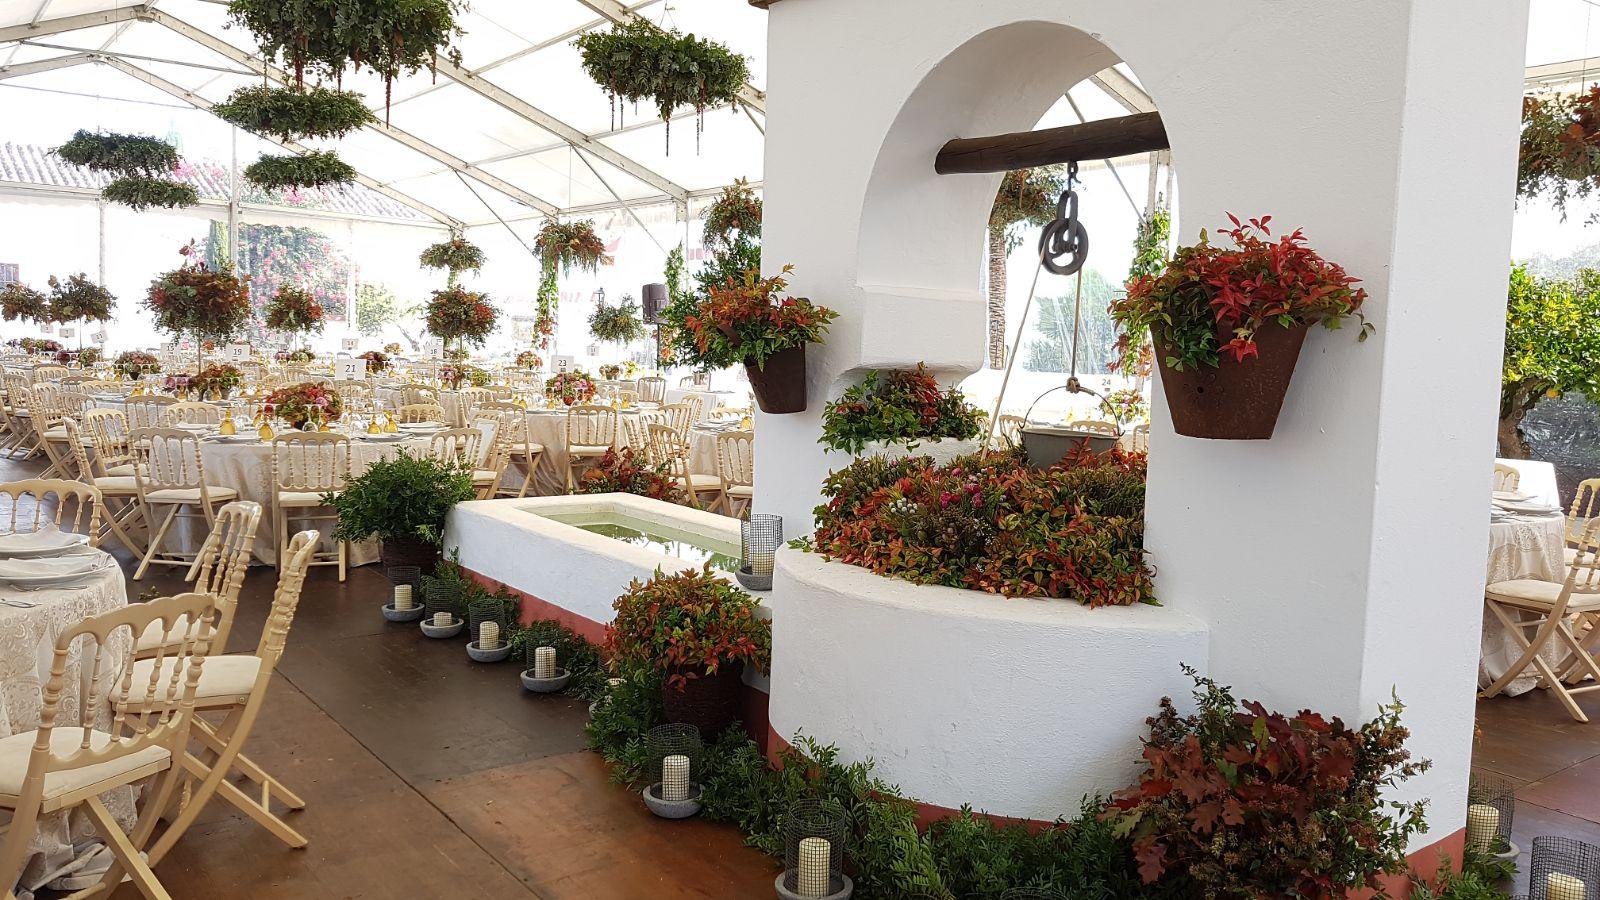 Decoraci n de boda oto al c rtamo flores florister a - Decoracion sevilla ...